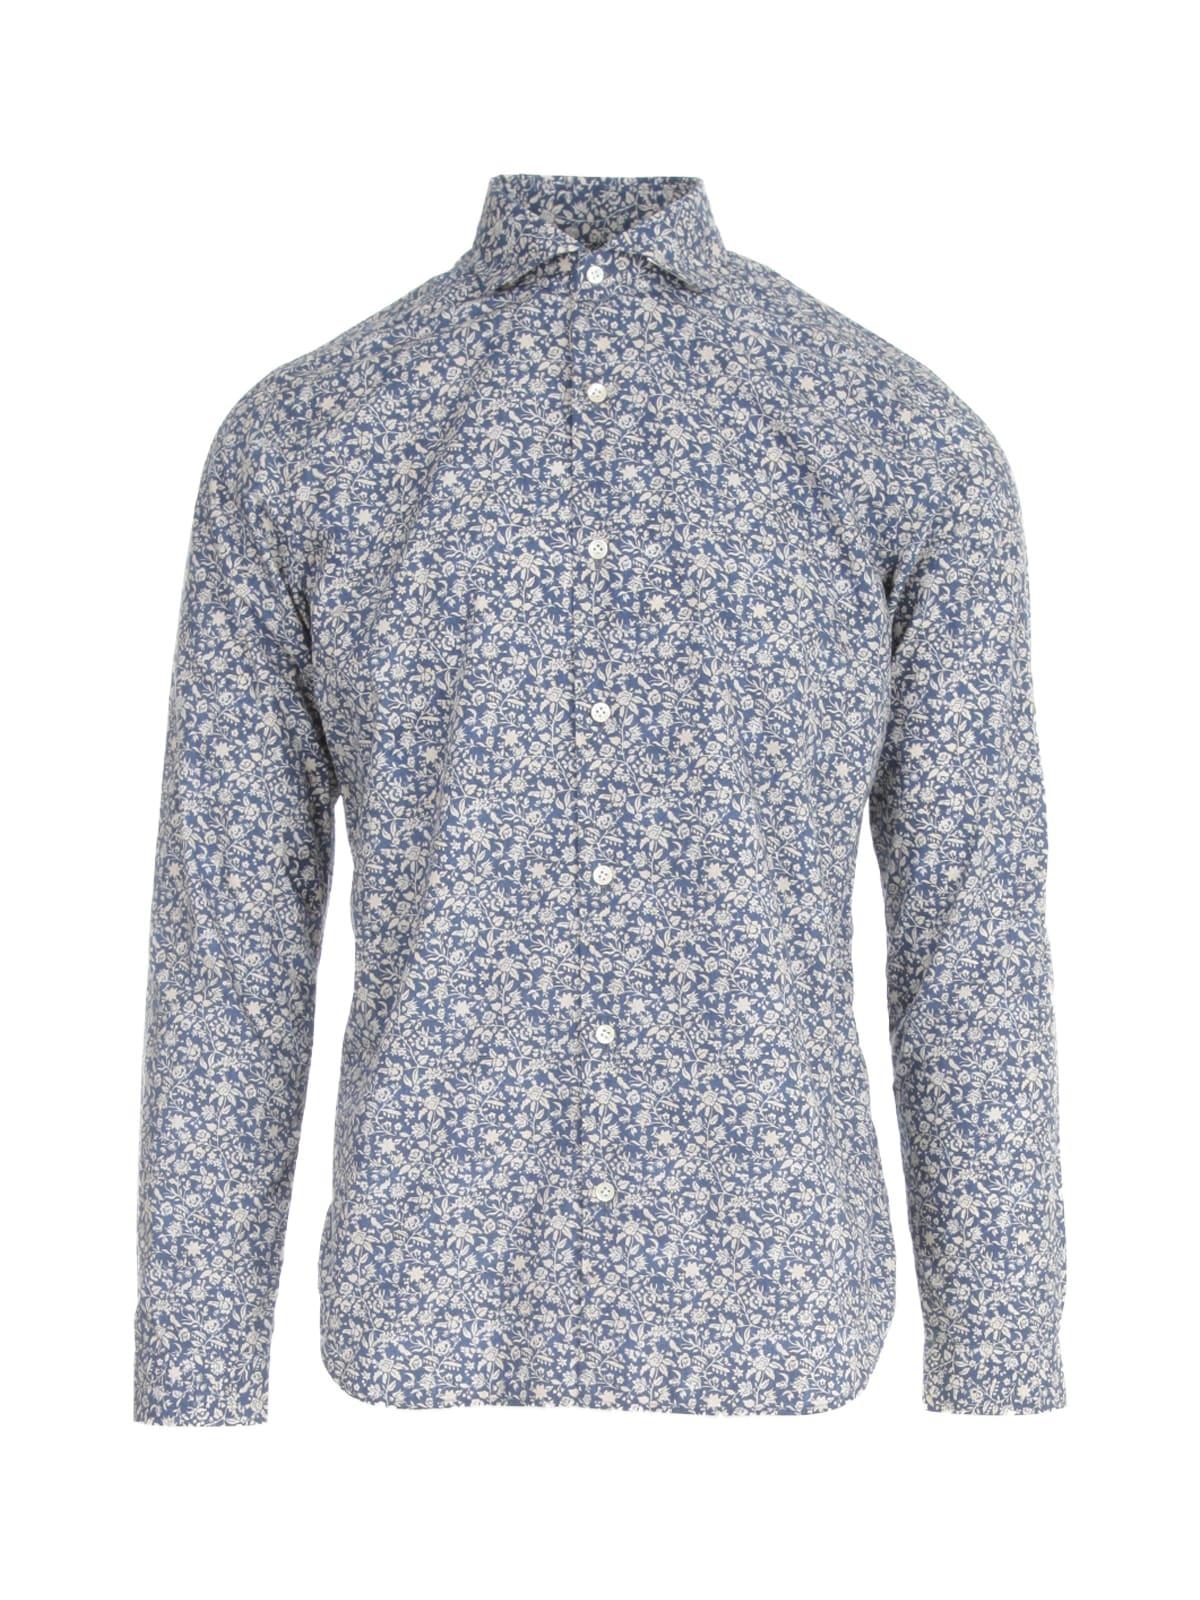 Microfantasy Shirt